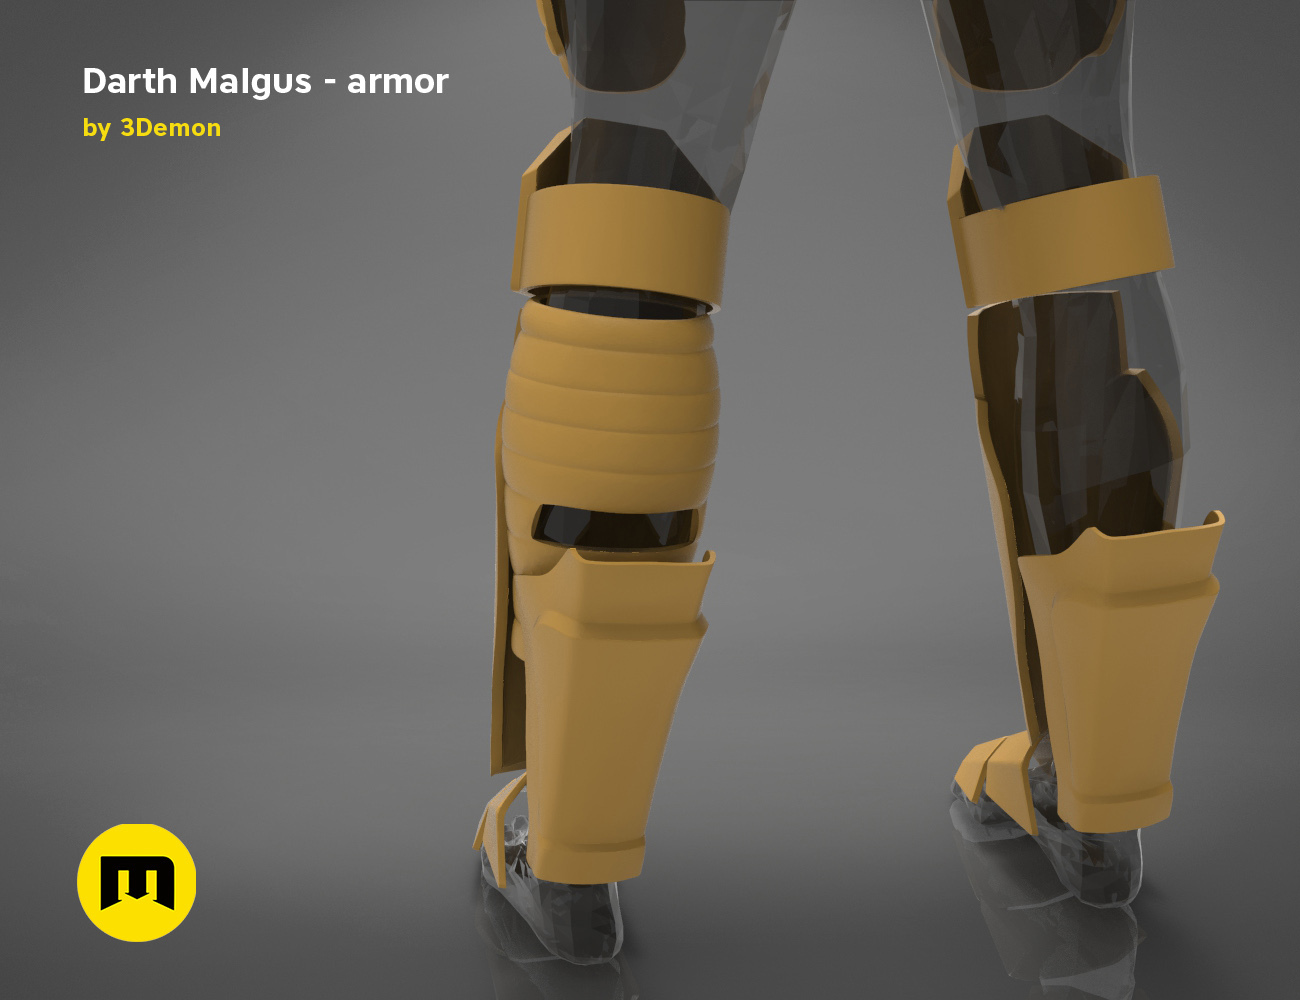 Darth-Malgus-armor-render_scene_basic.107 kopie.jpg Download STL file Darth Malgus's full size armor • Design to 3D print, 3D-mon